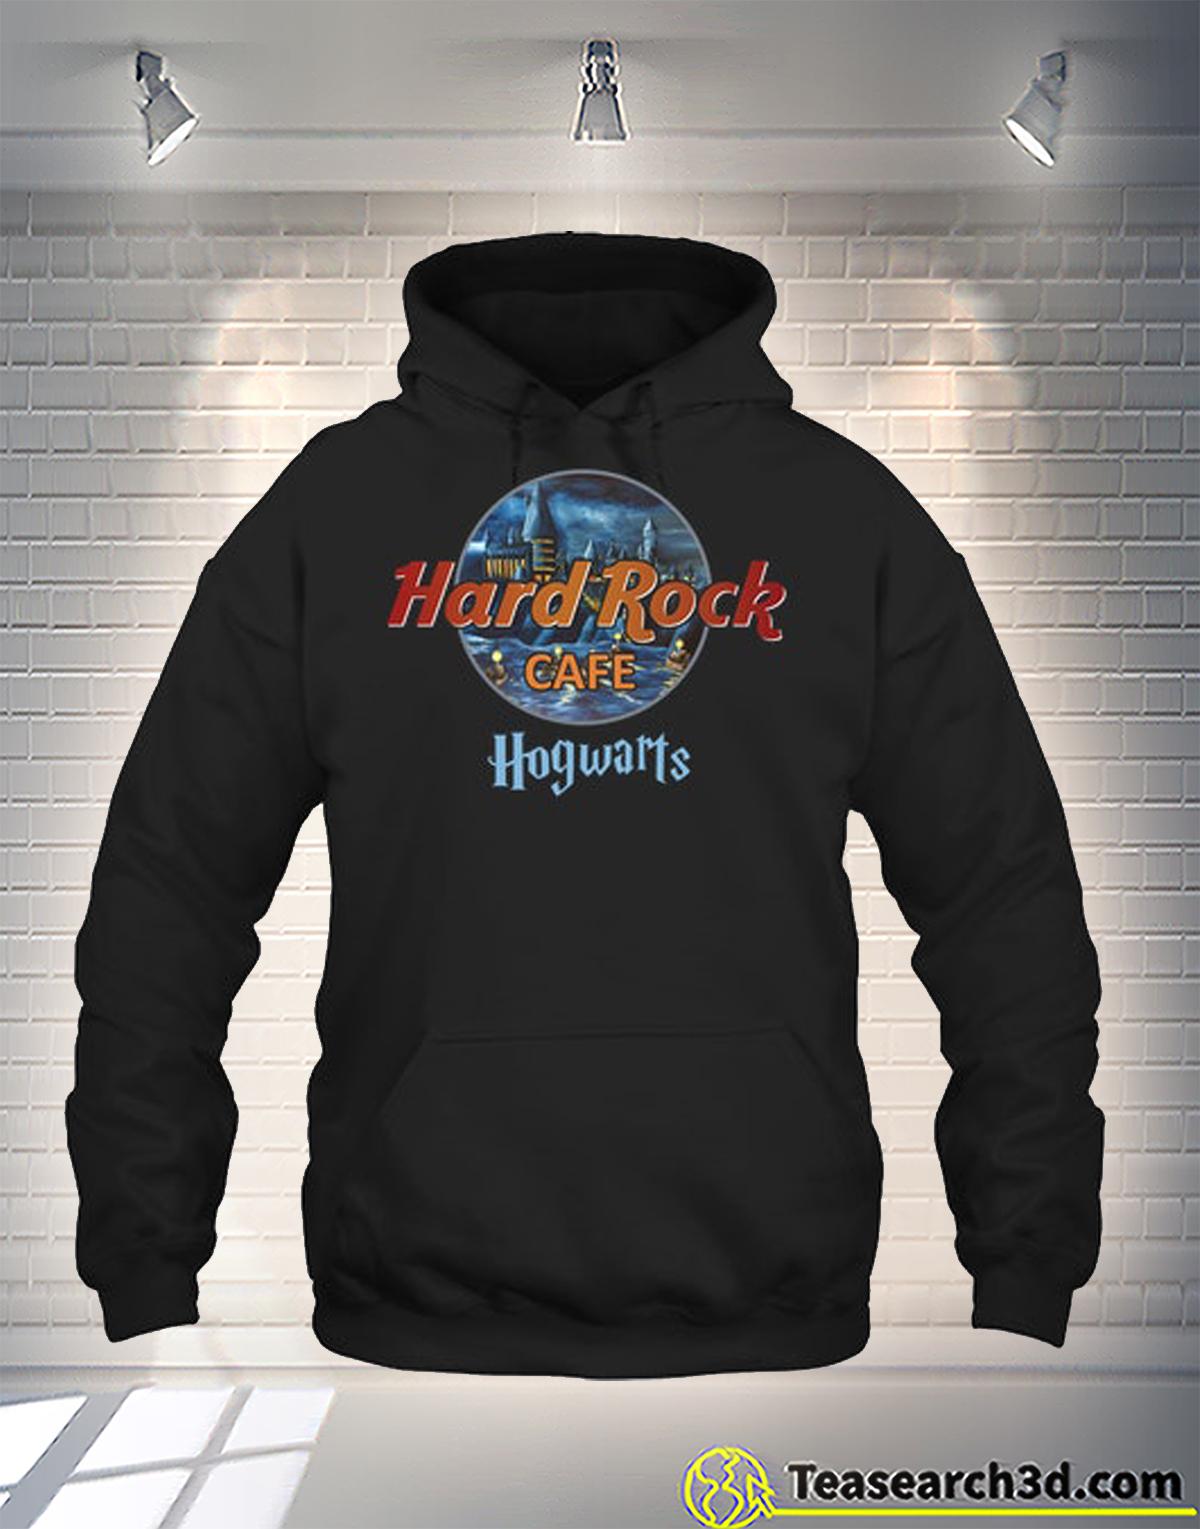 Hard rock cafe hogwarts hoodie